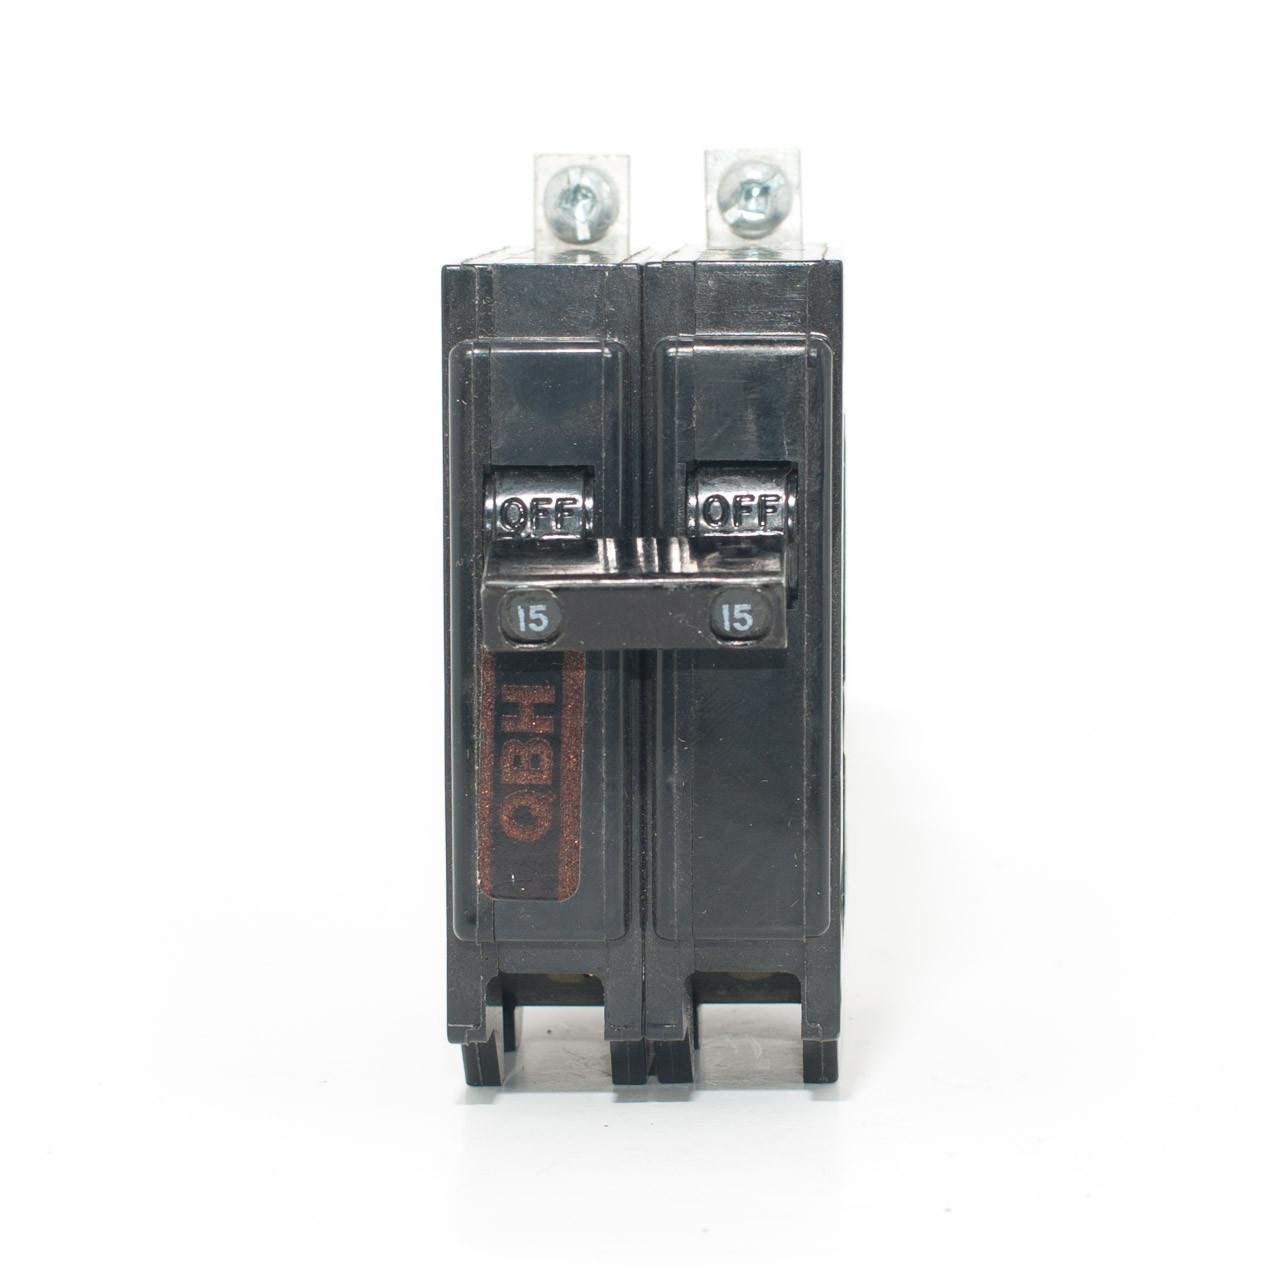 Eaton Cutler-Hammer BAB2015 2 Pole 15 Amp 240 Volt Circuit Breaker